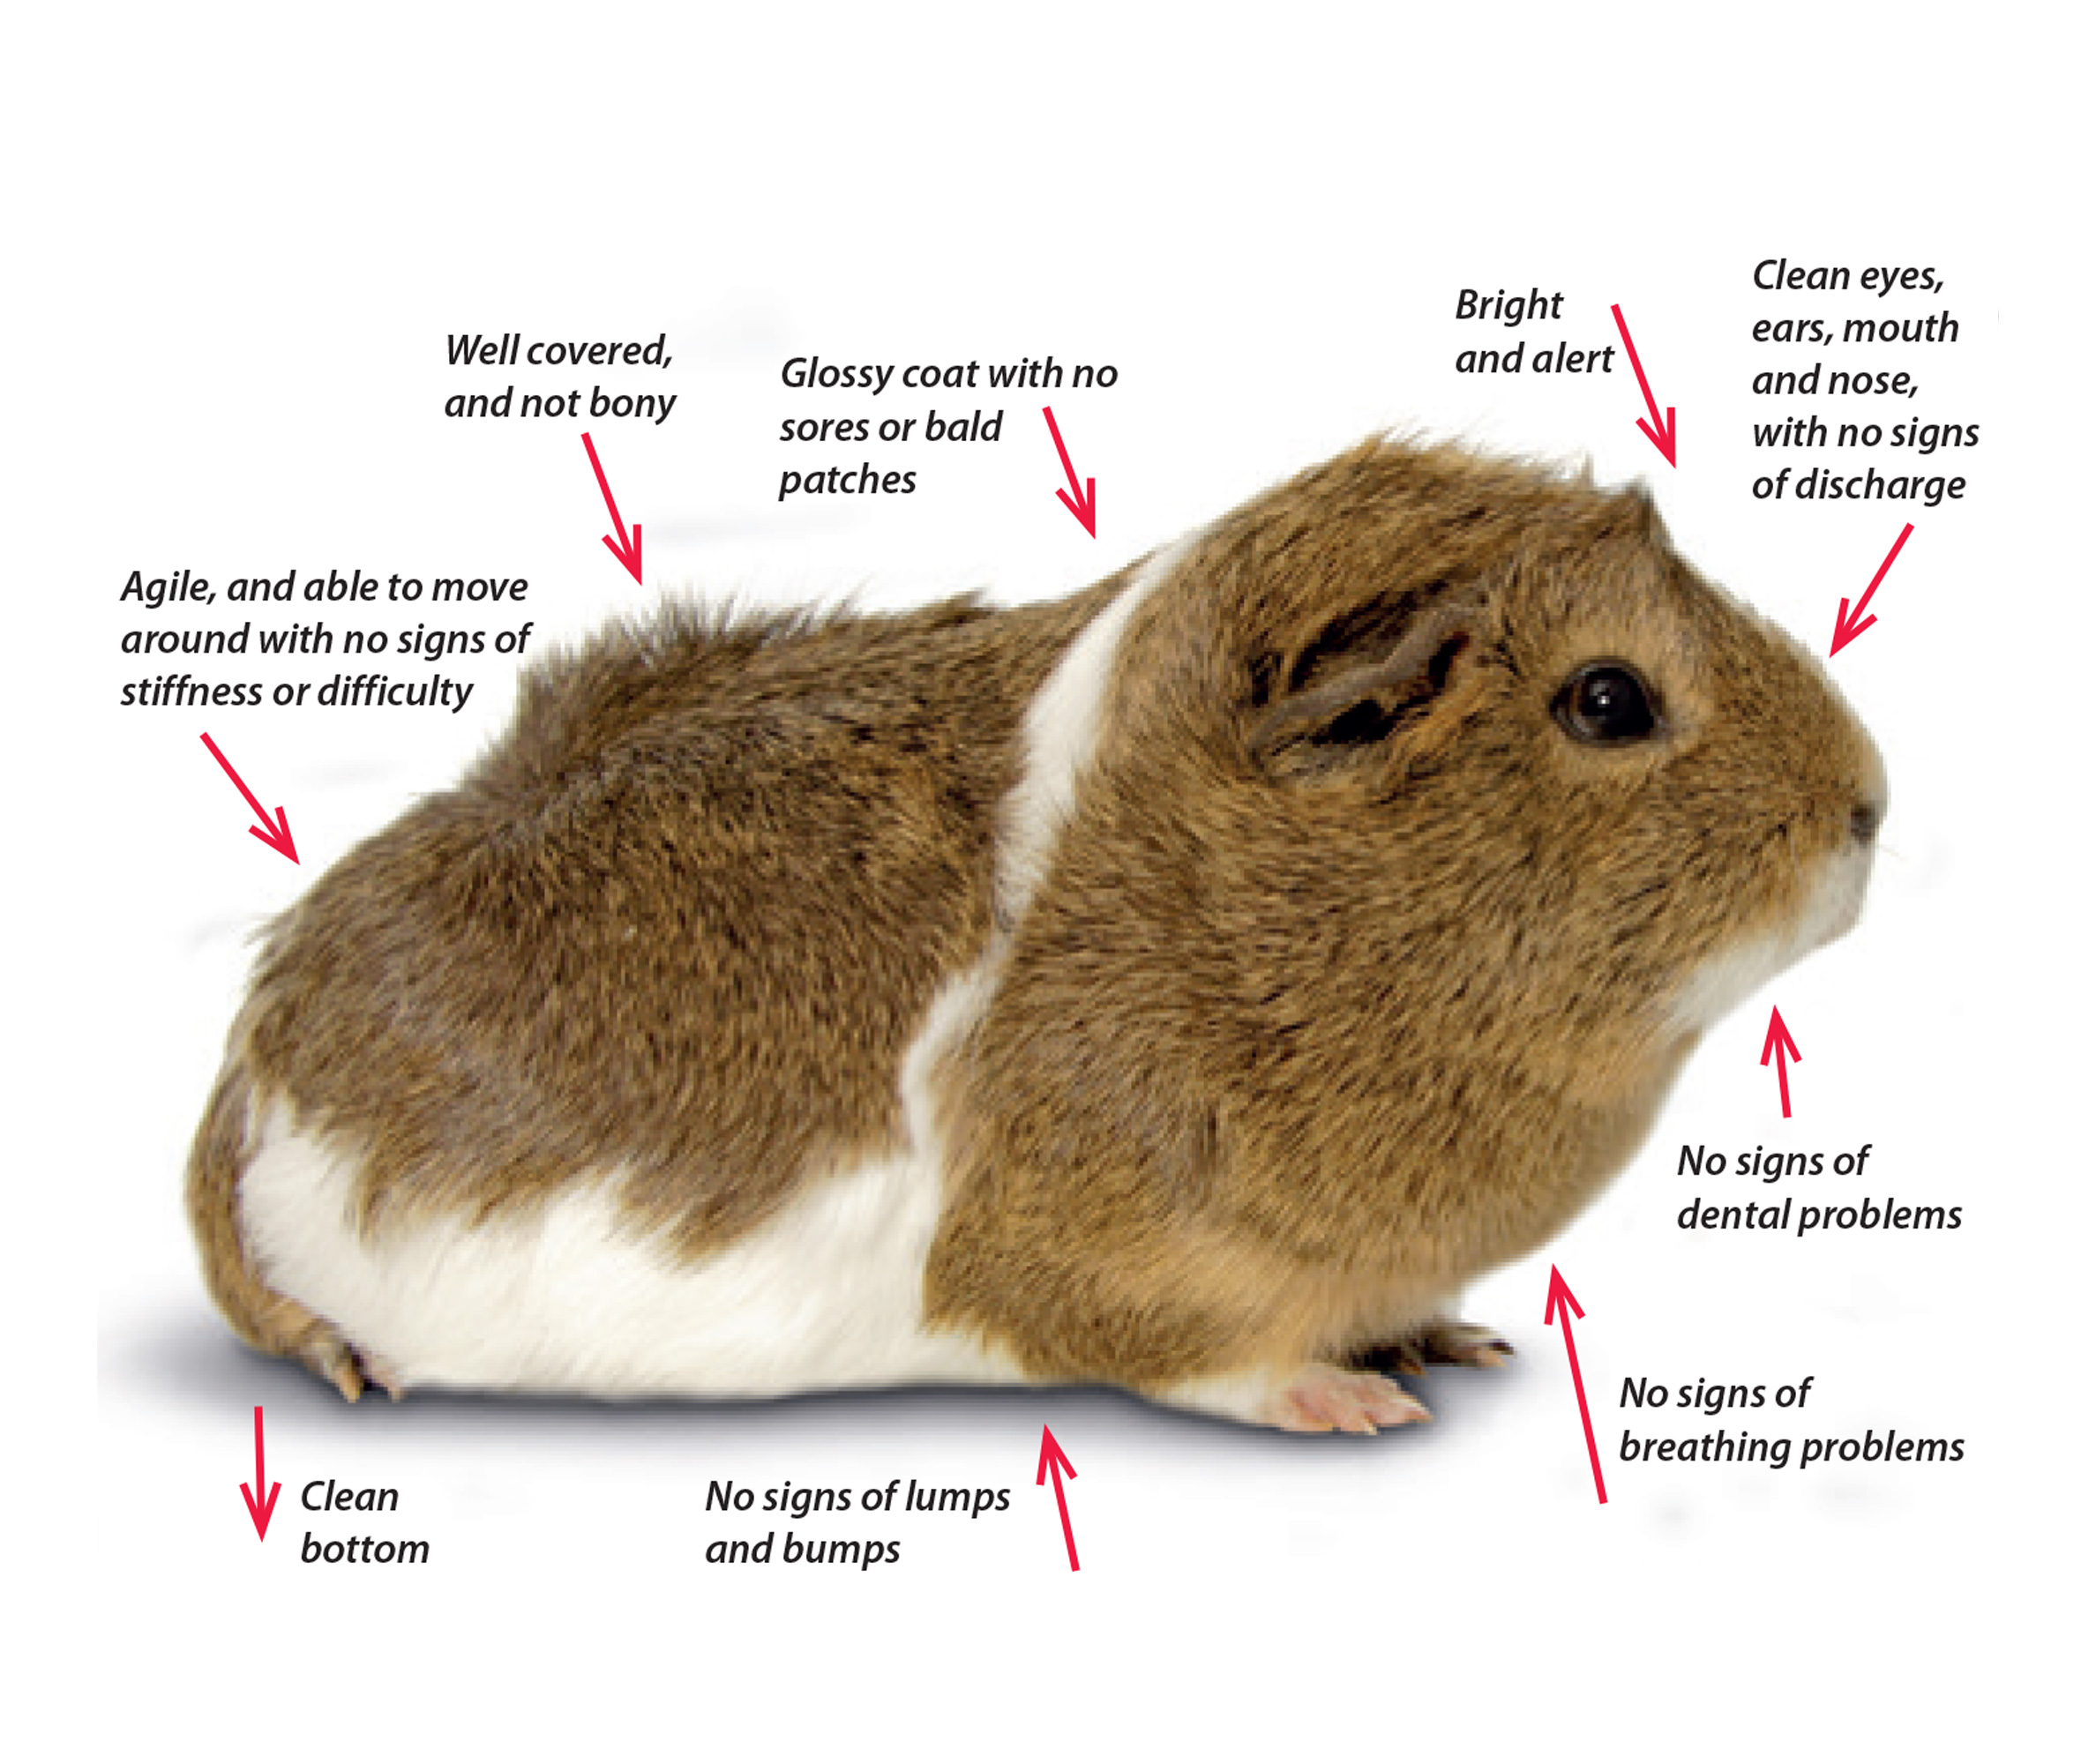 Guide to checking guinea pig health